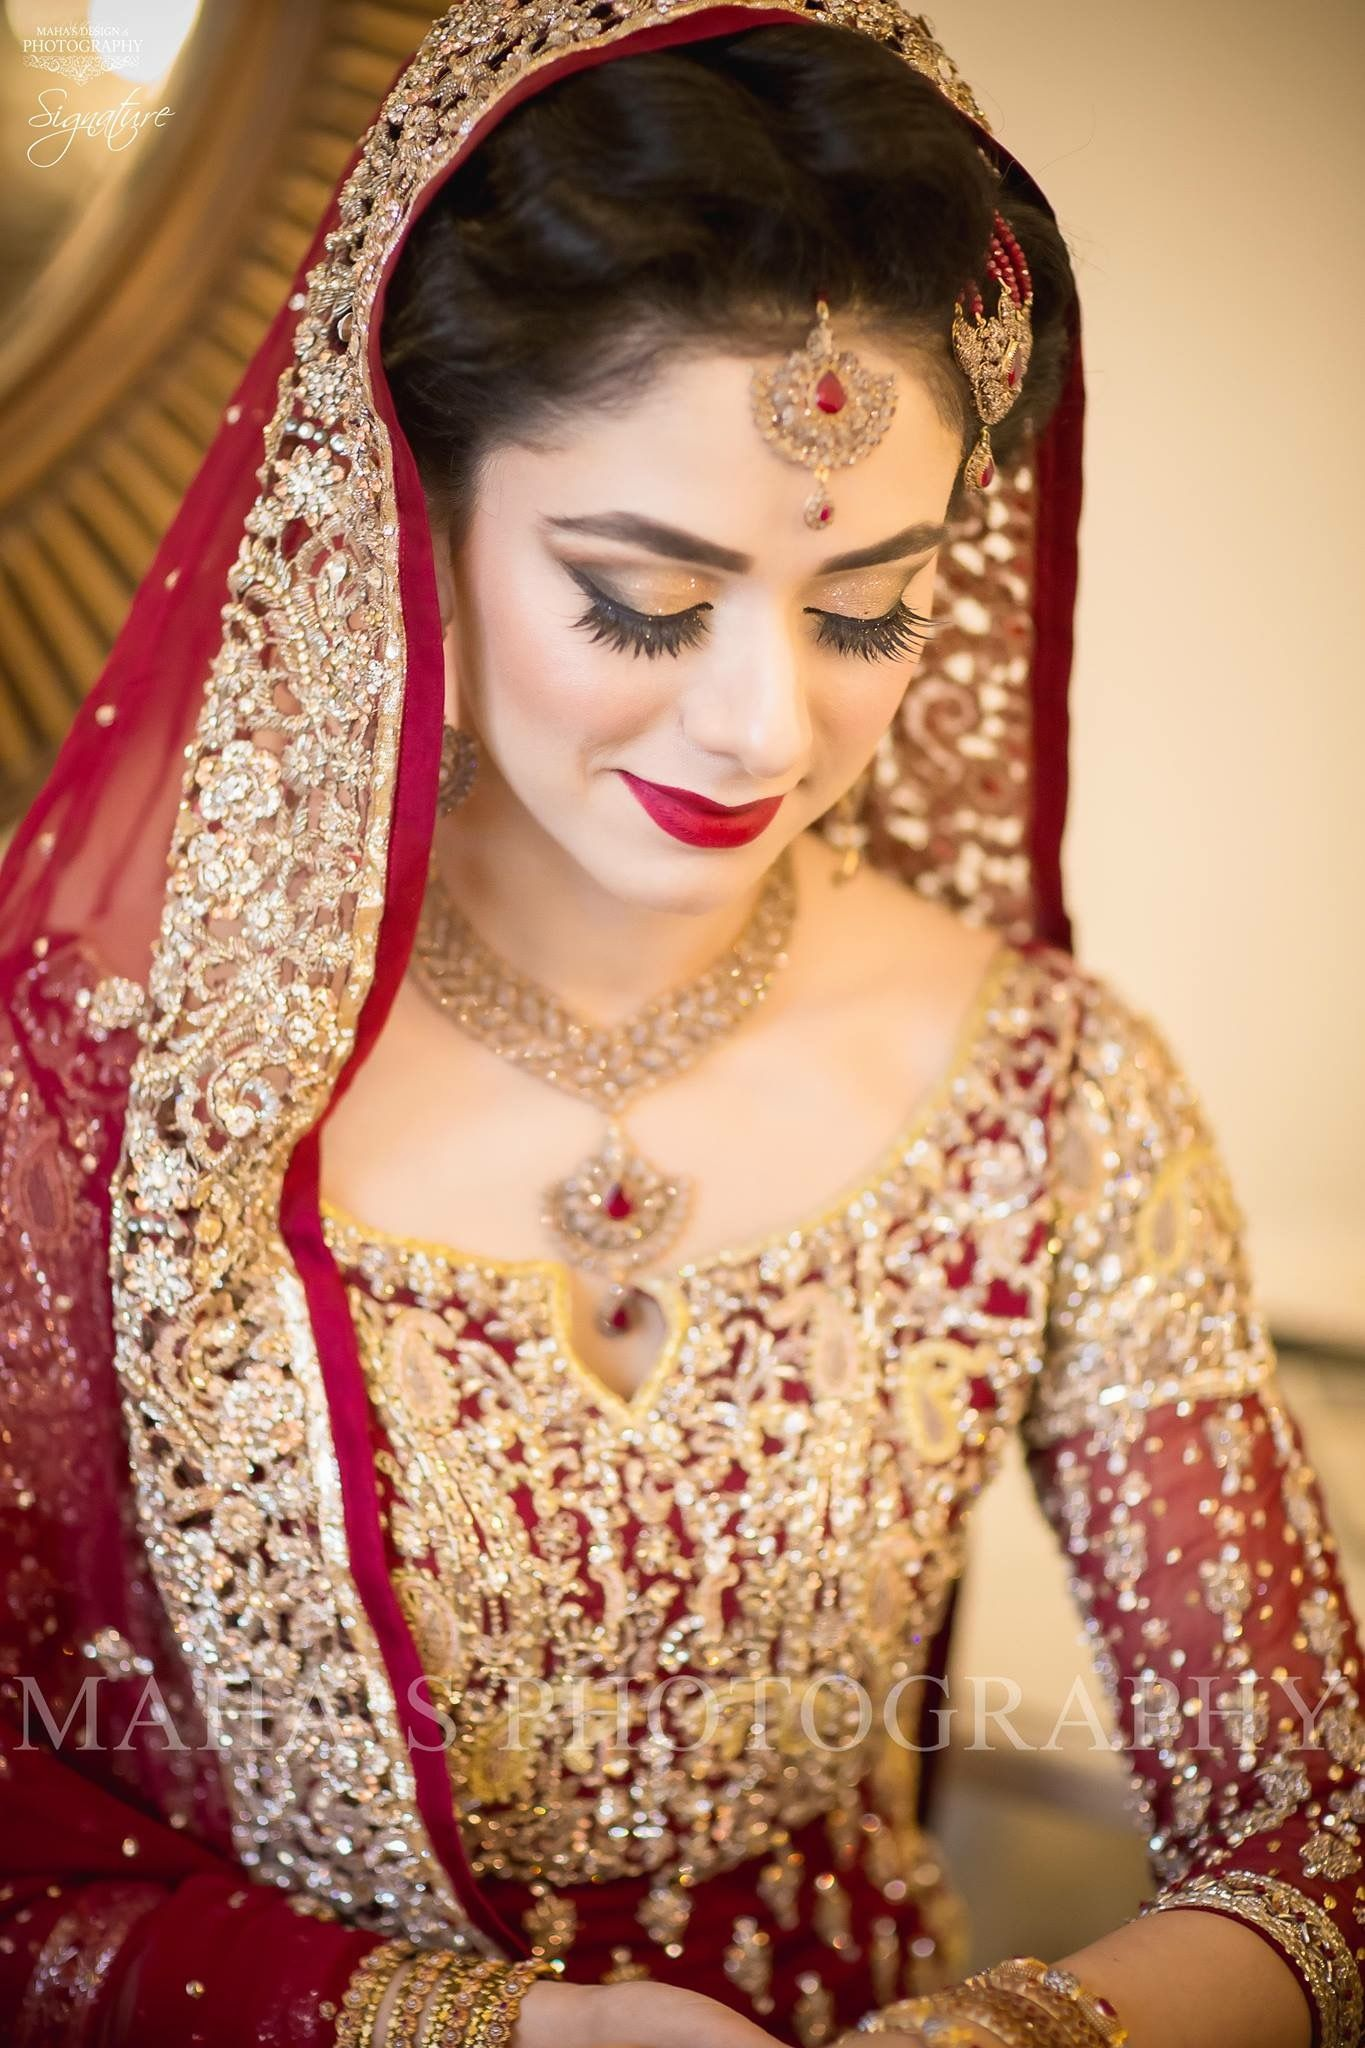 Pin von Eram Alam auf Bollywood Style + Desi Shaadi | Pinterest ...